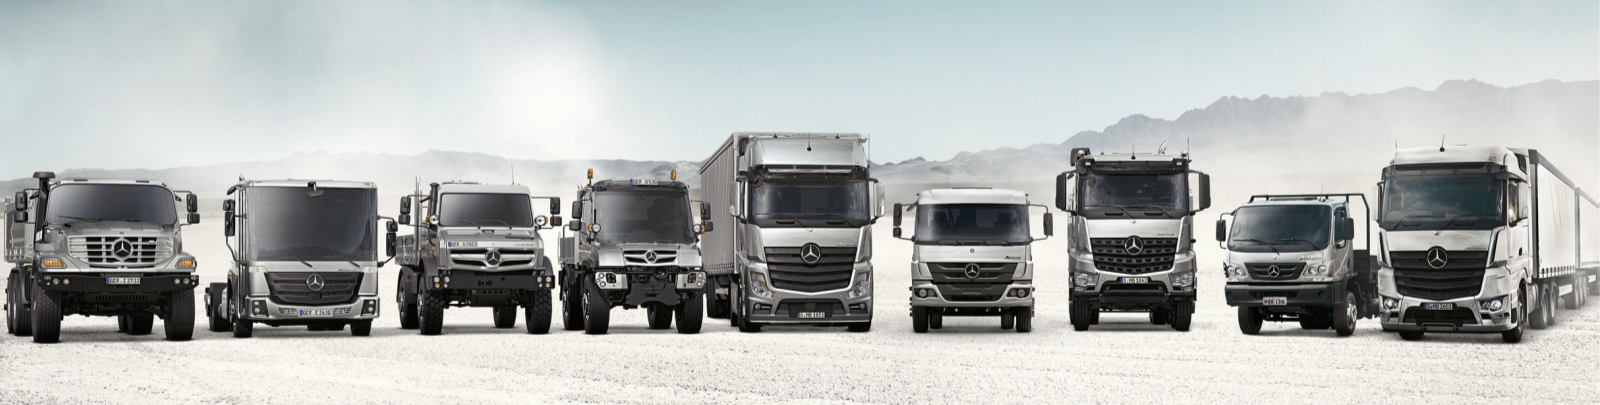 Trucks_Heading_1